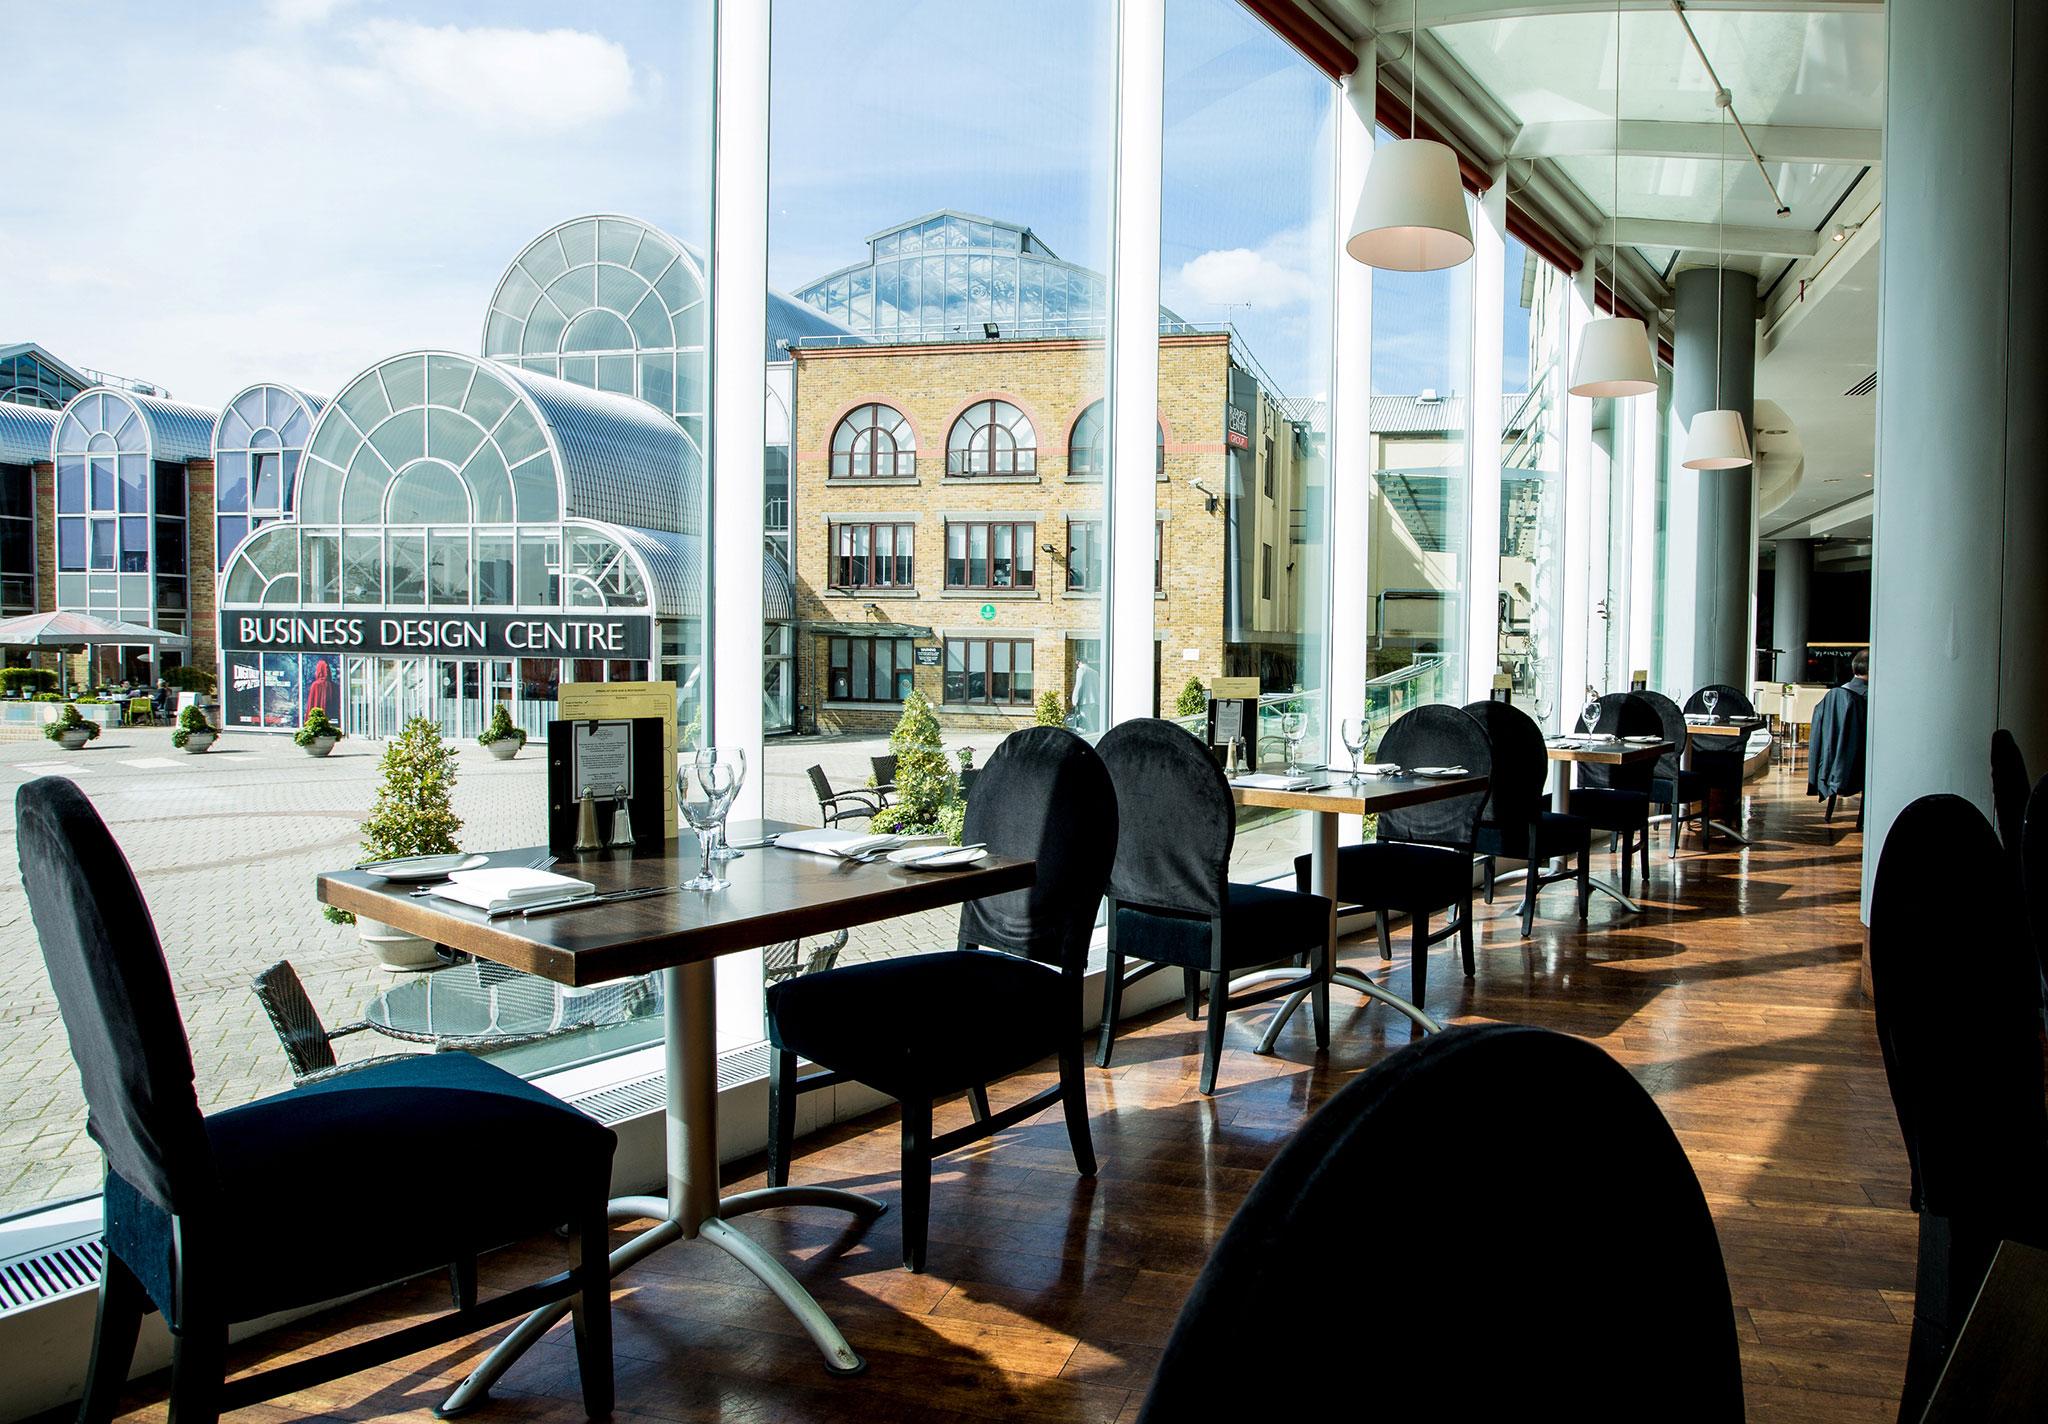 Stansted Hotels Tripadvisor